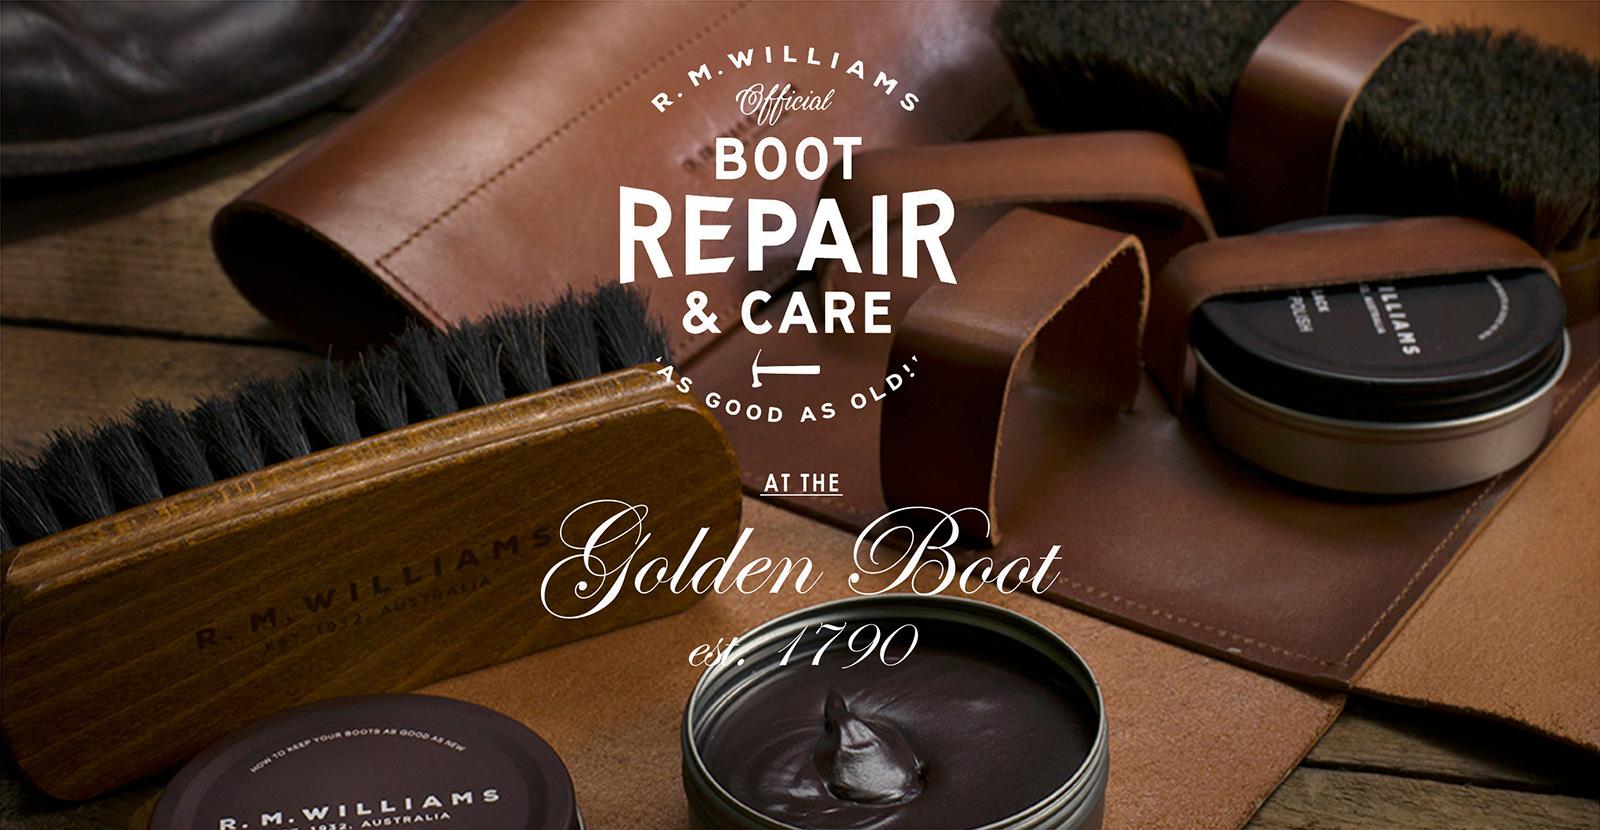 R. M. Williams boot repair and care